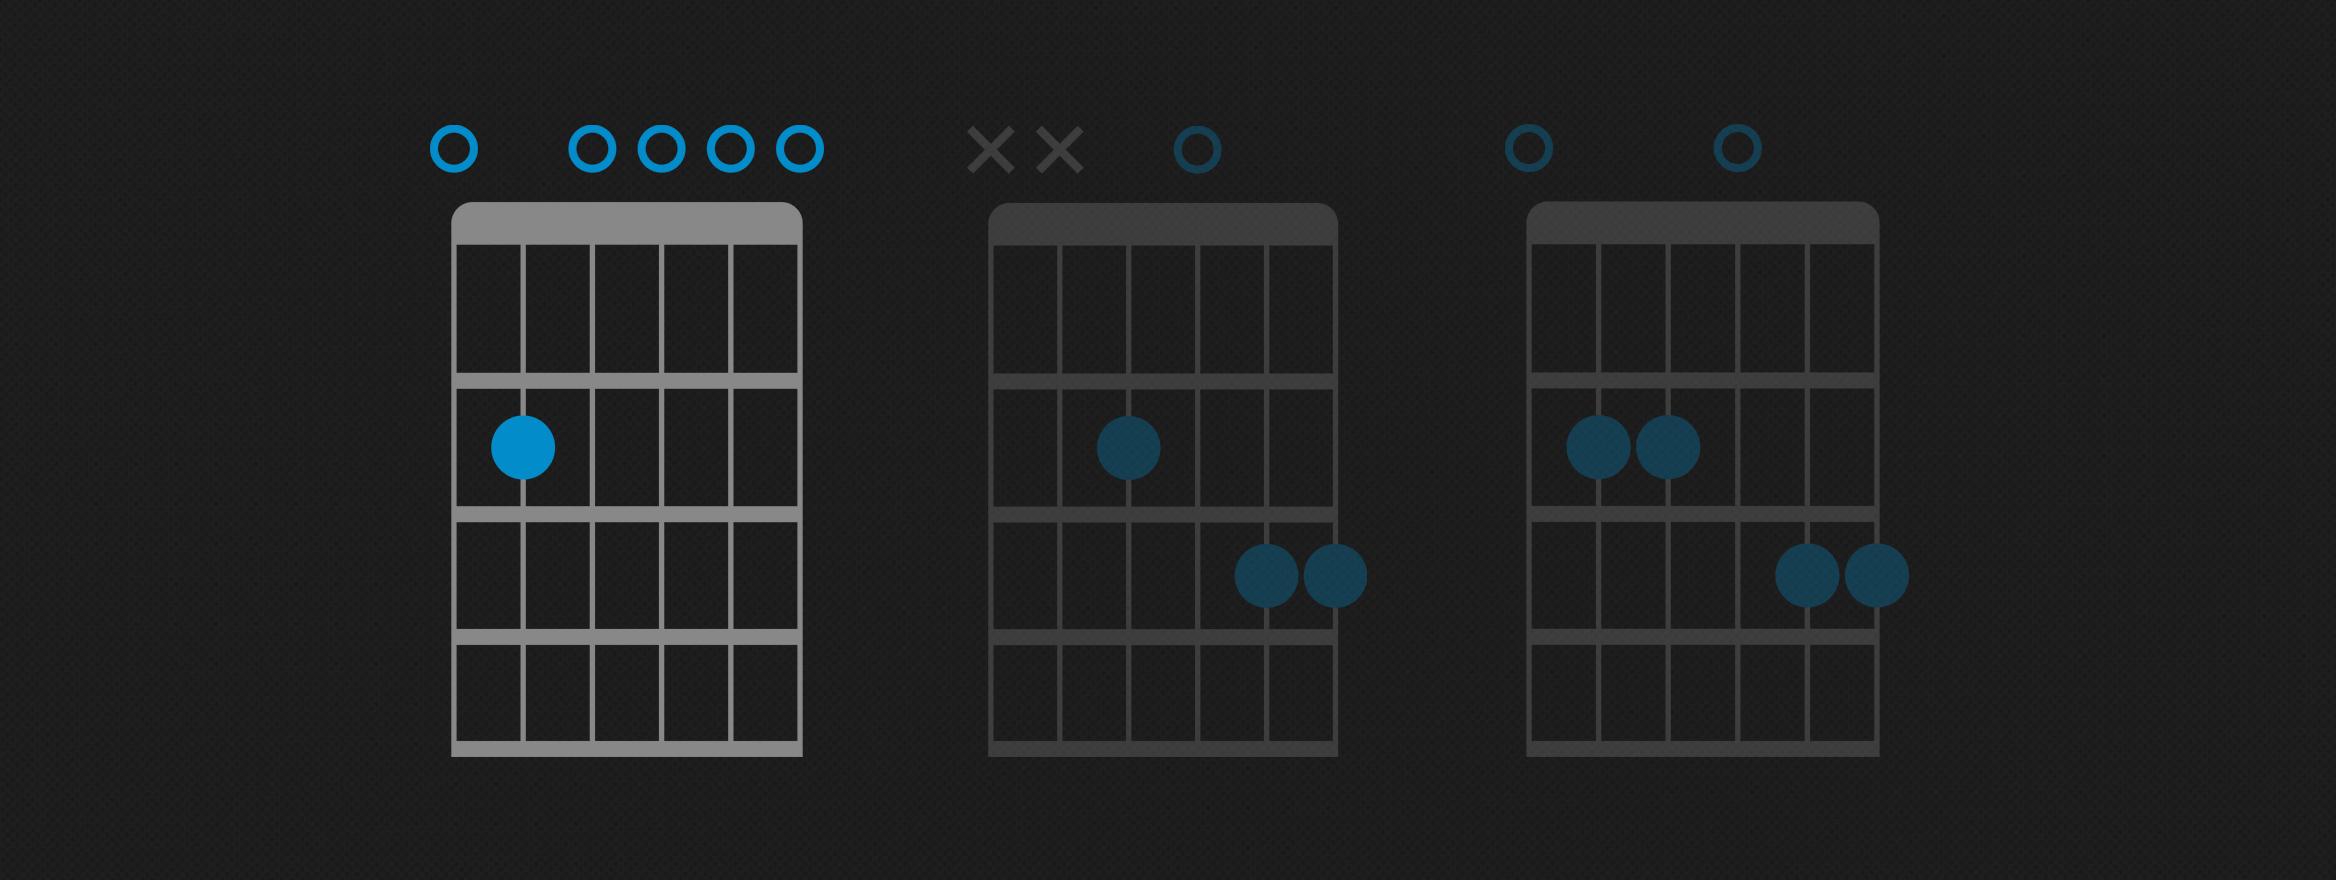 How to Play E Minor 15 Guitar Chord   Em15 Chord   Fender Play